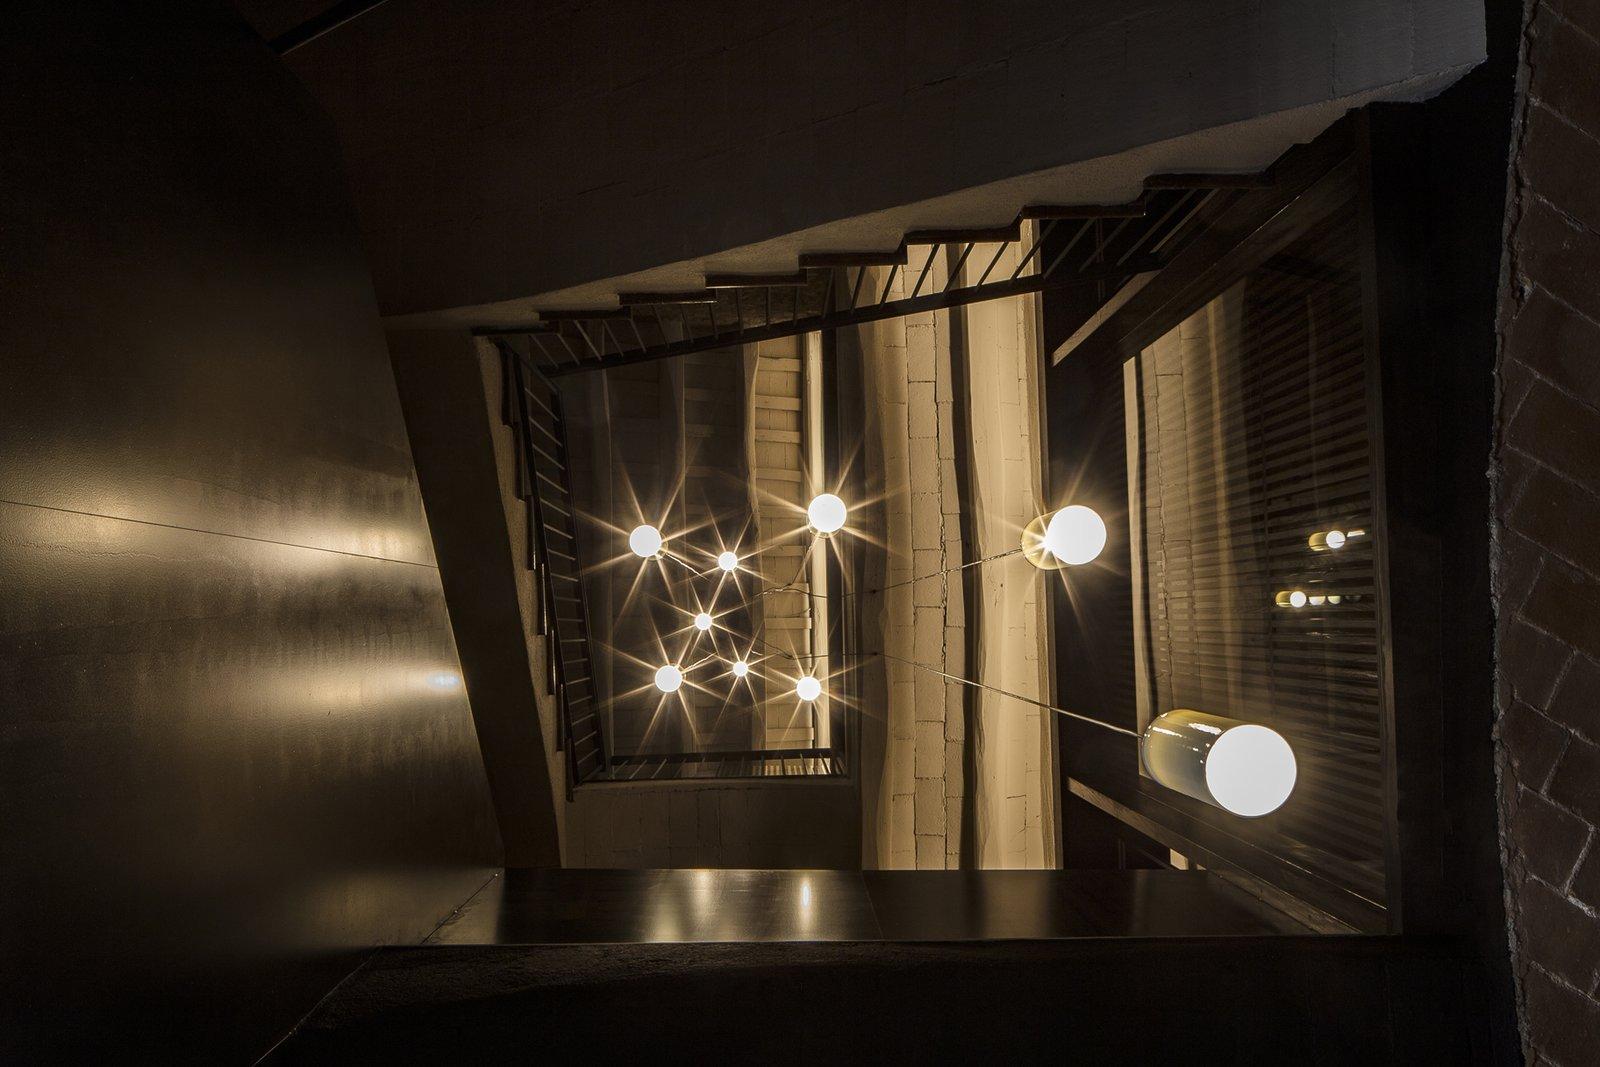 Staircase, Metal Railing, Metal Tread, and Wood Tread  Sant Martí House by Francesc Rifé Studio